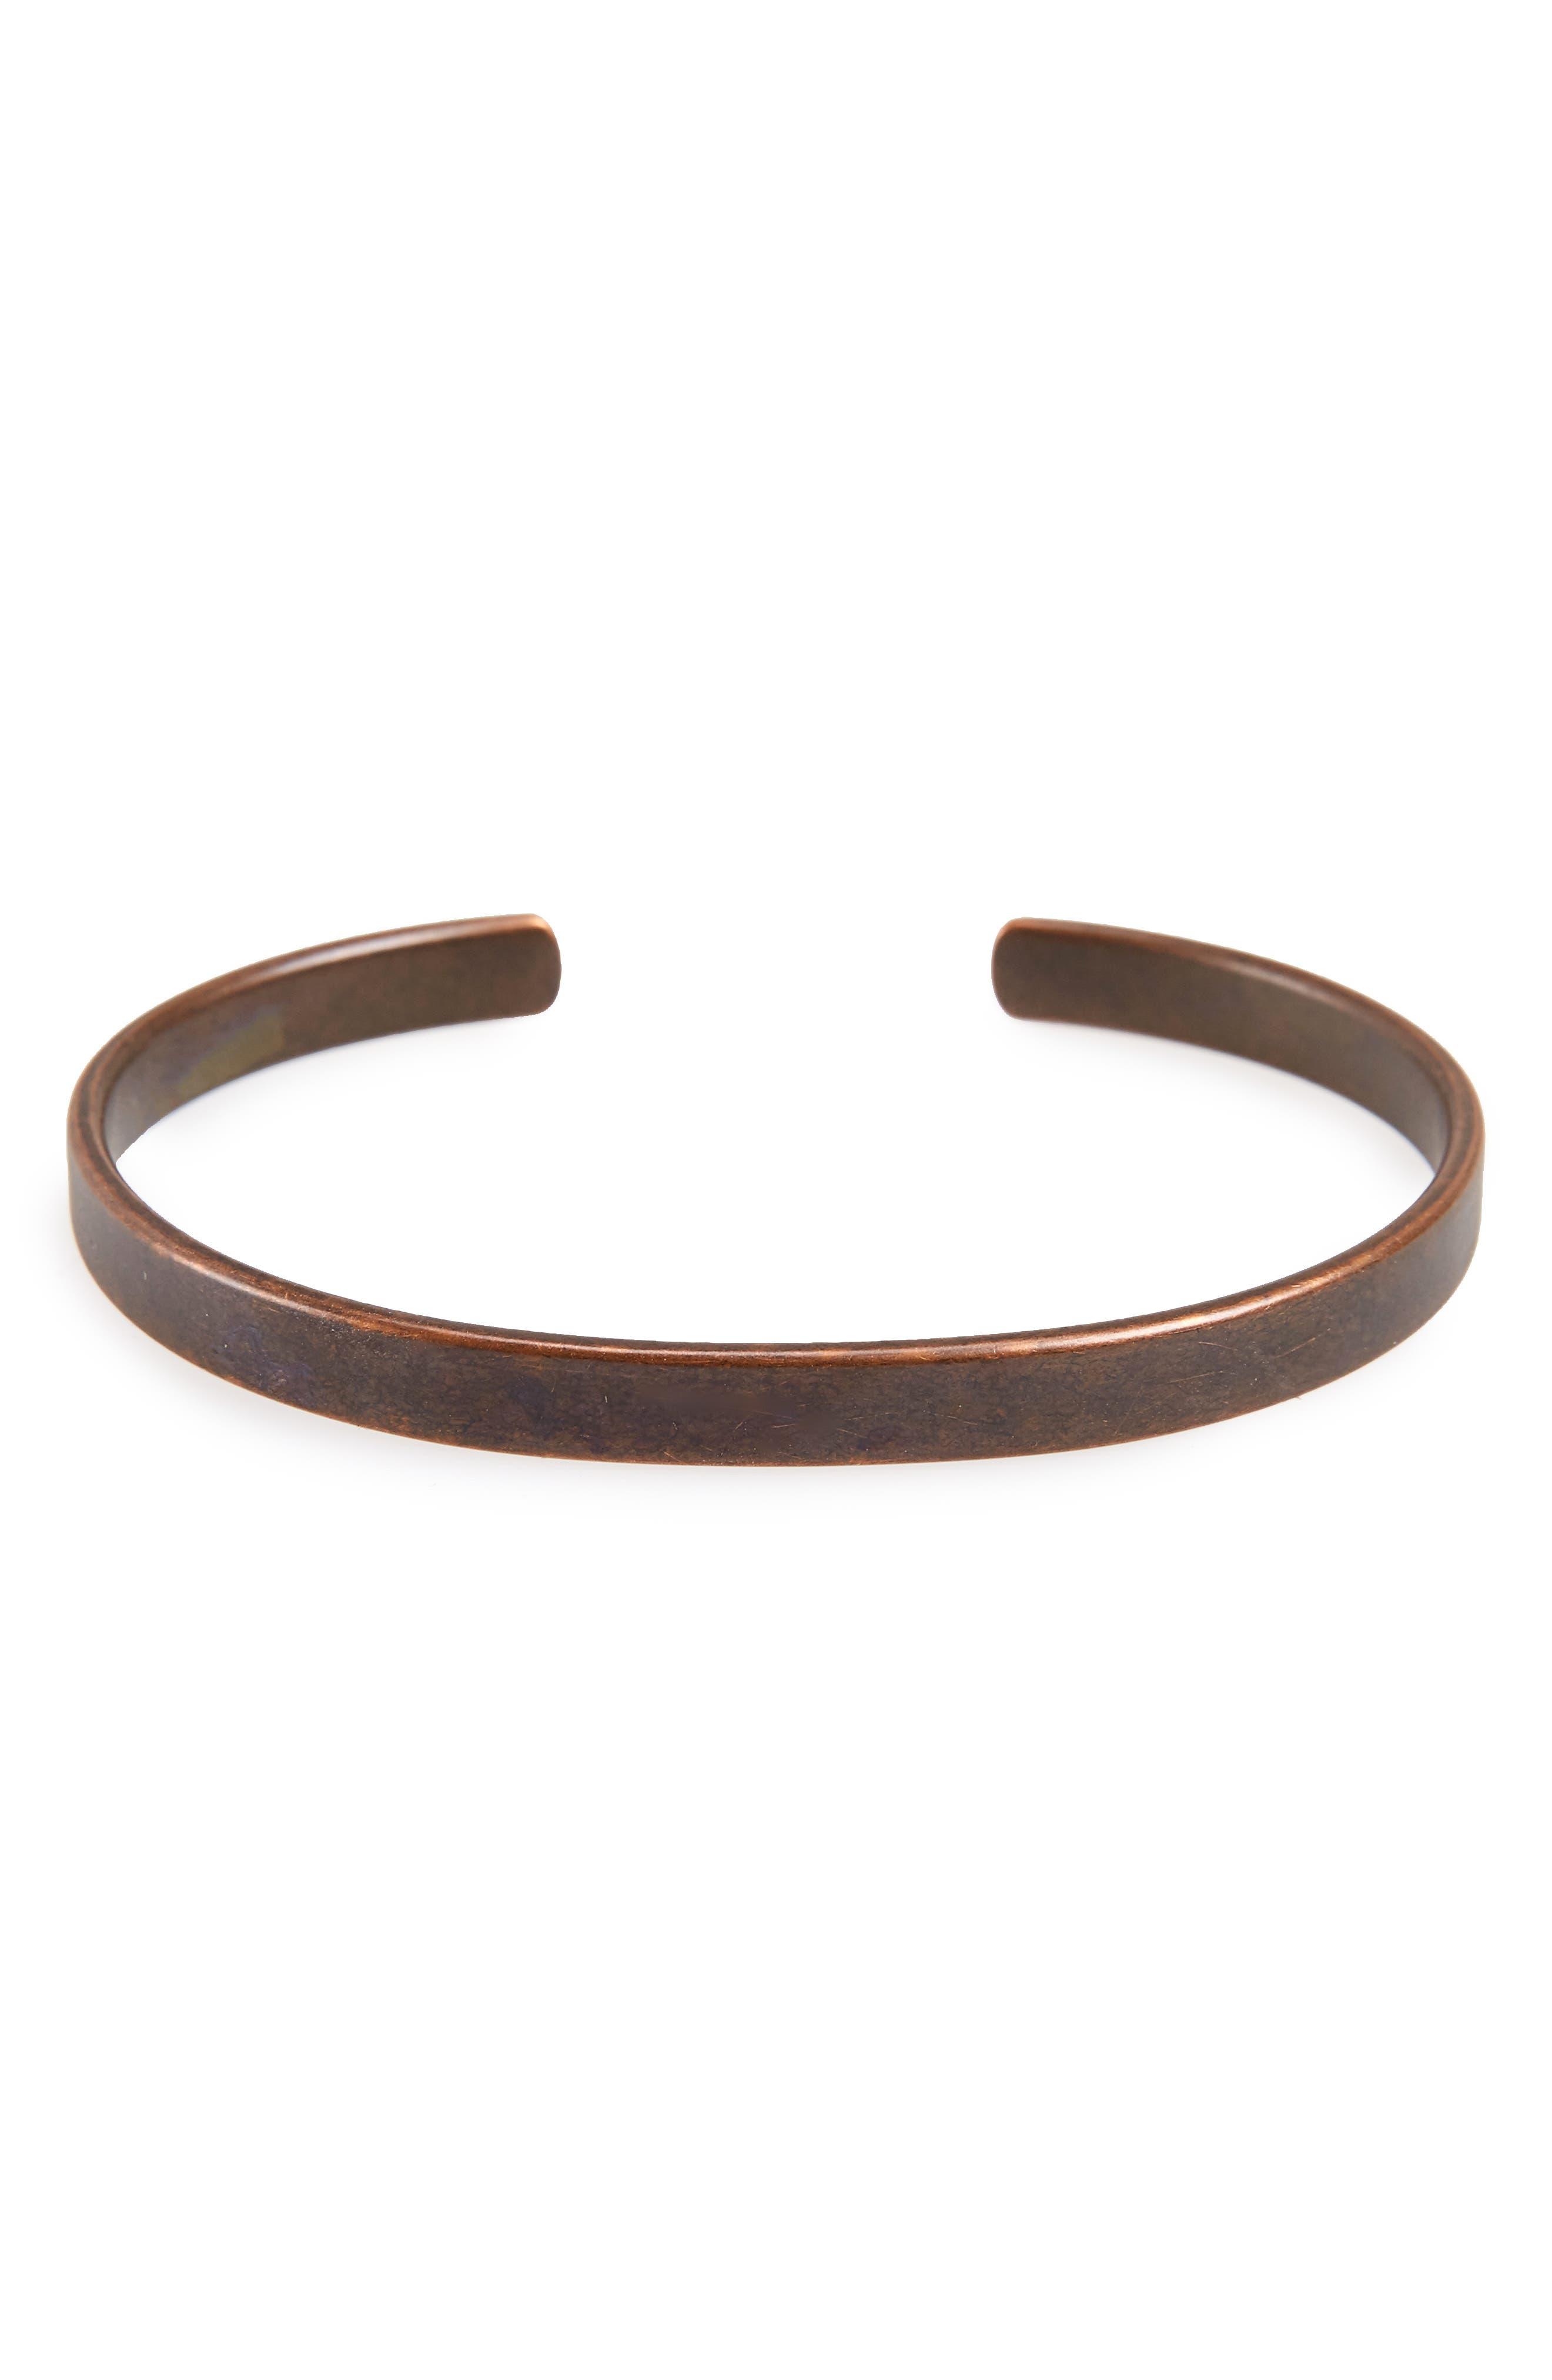 Main Image - Caputo & Co. Metal Cuff Bracelet